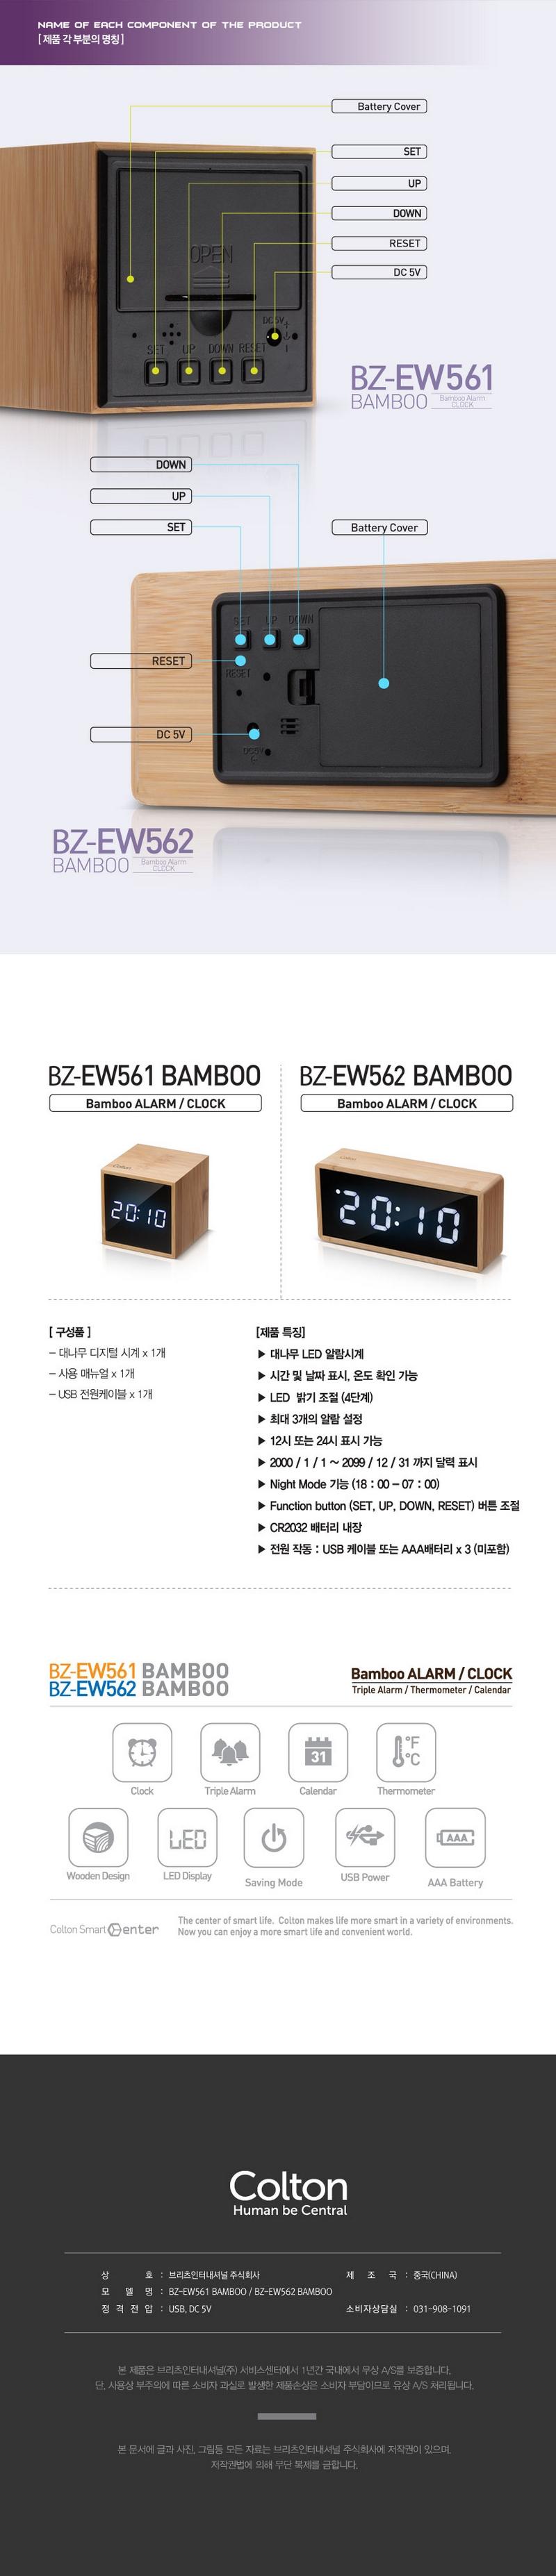 Britz 브리츠인터내셔널 콜튼 BZ-EW562 BAMBOO